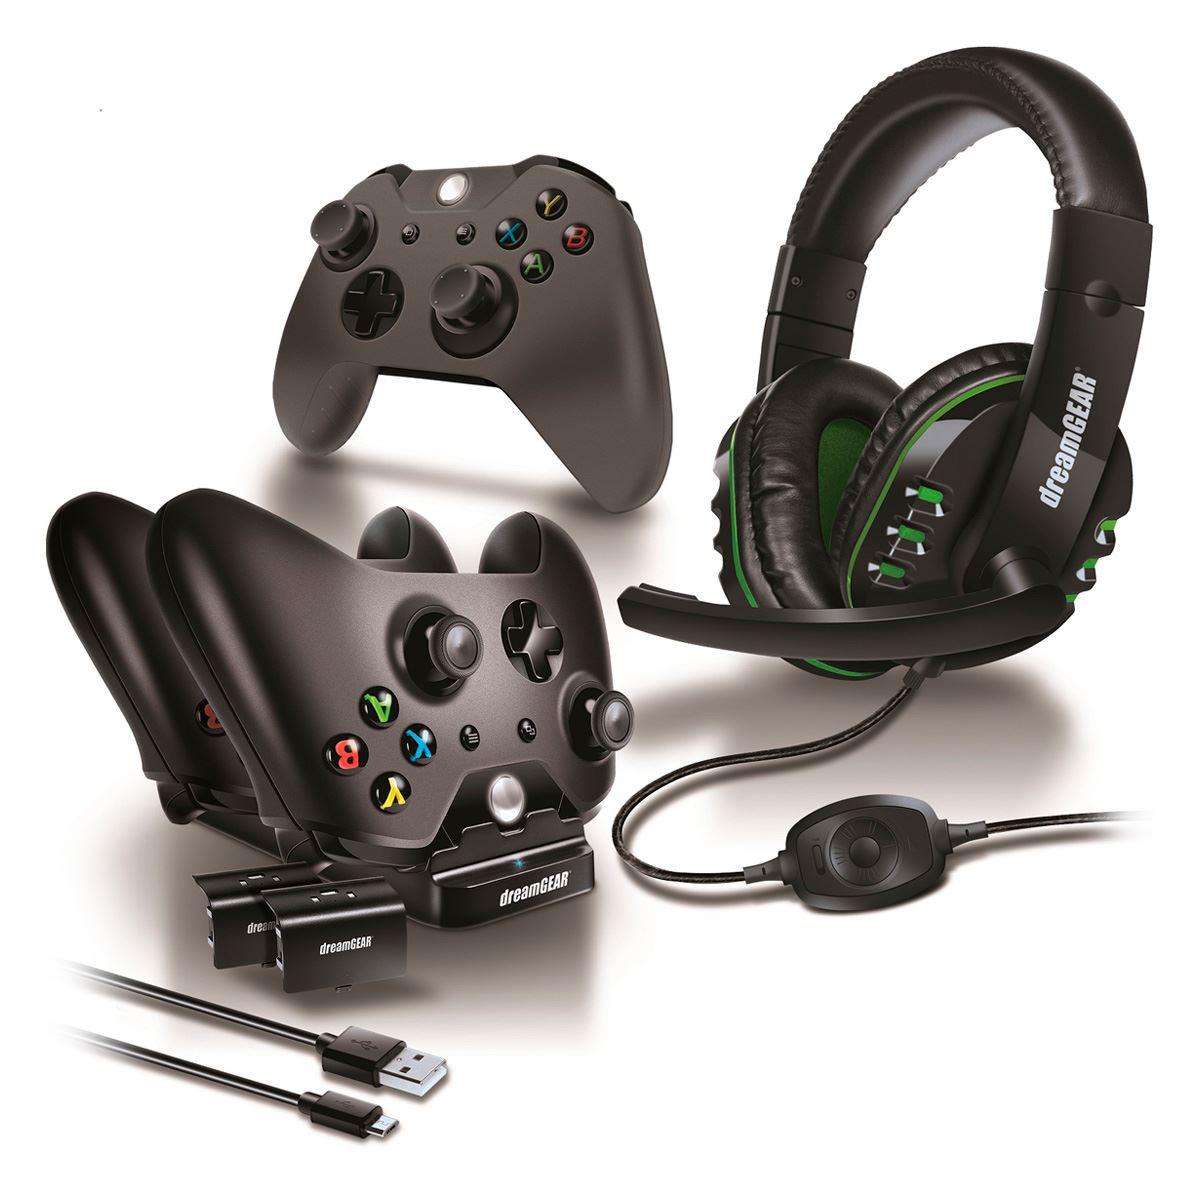 Xbox One Gamer Kit Dreamgear